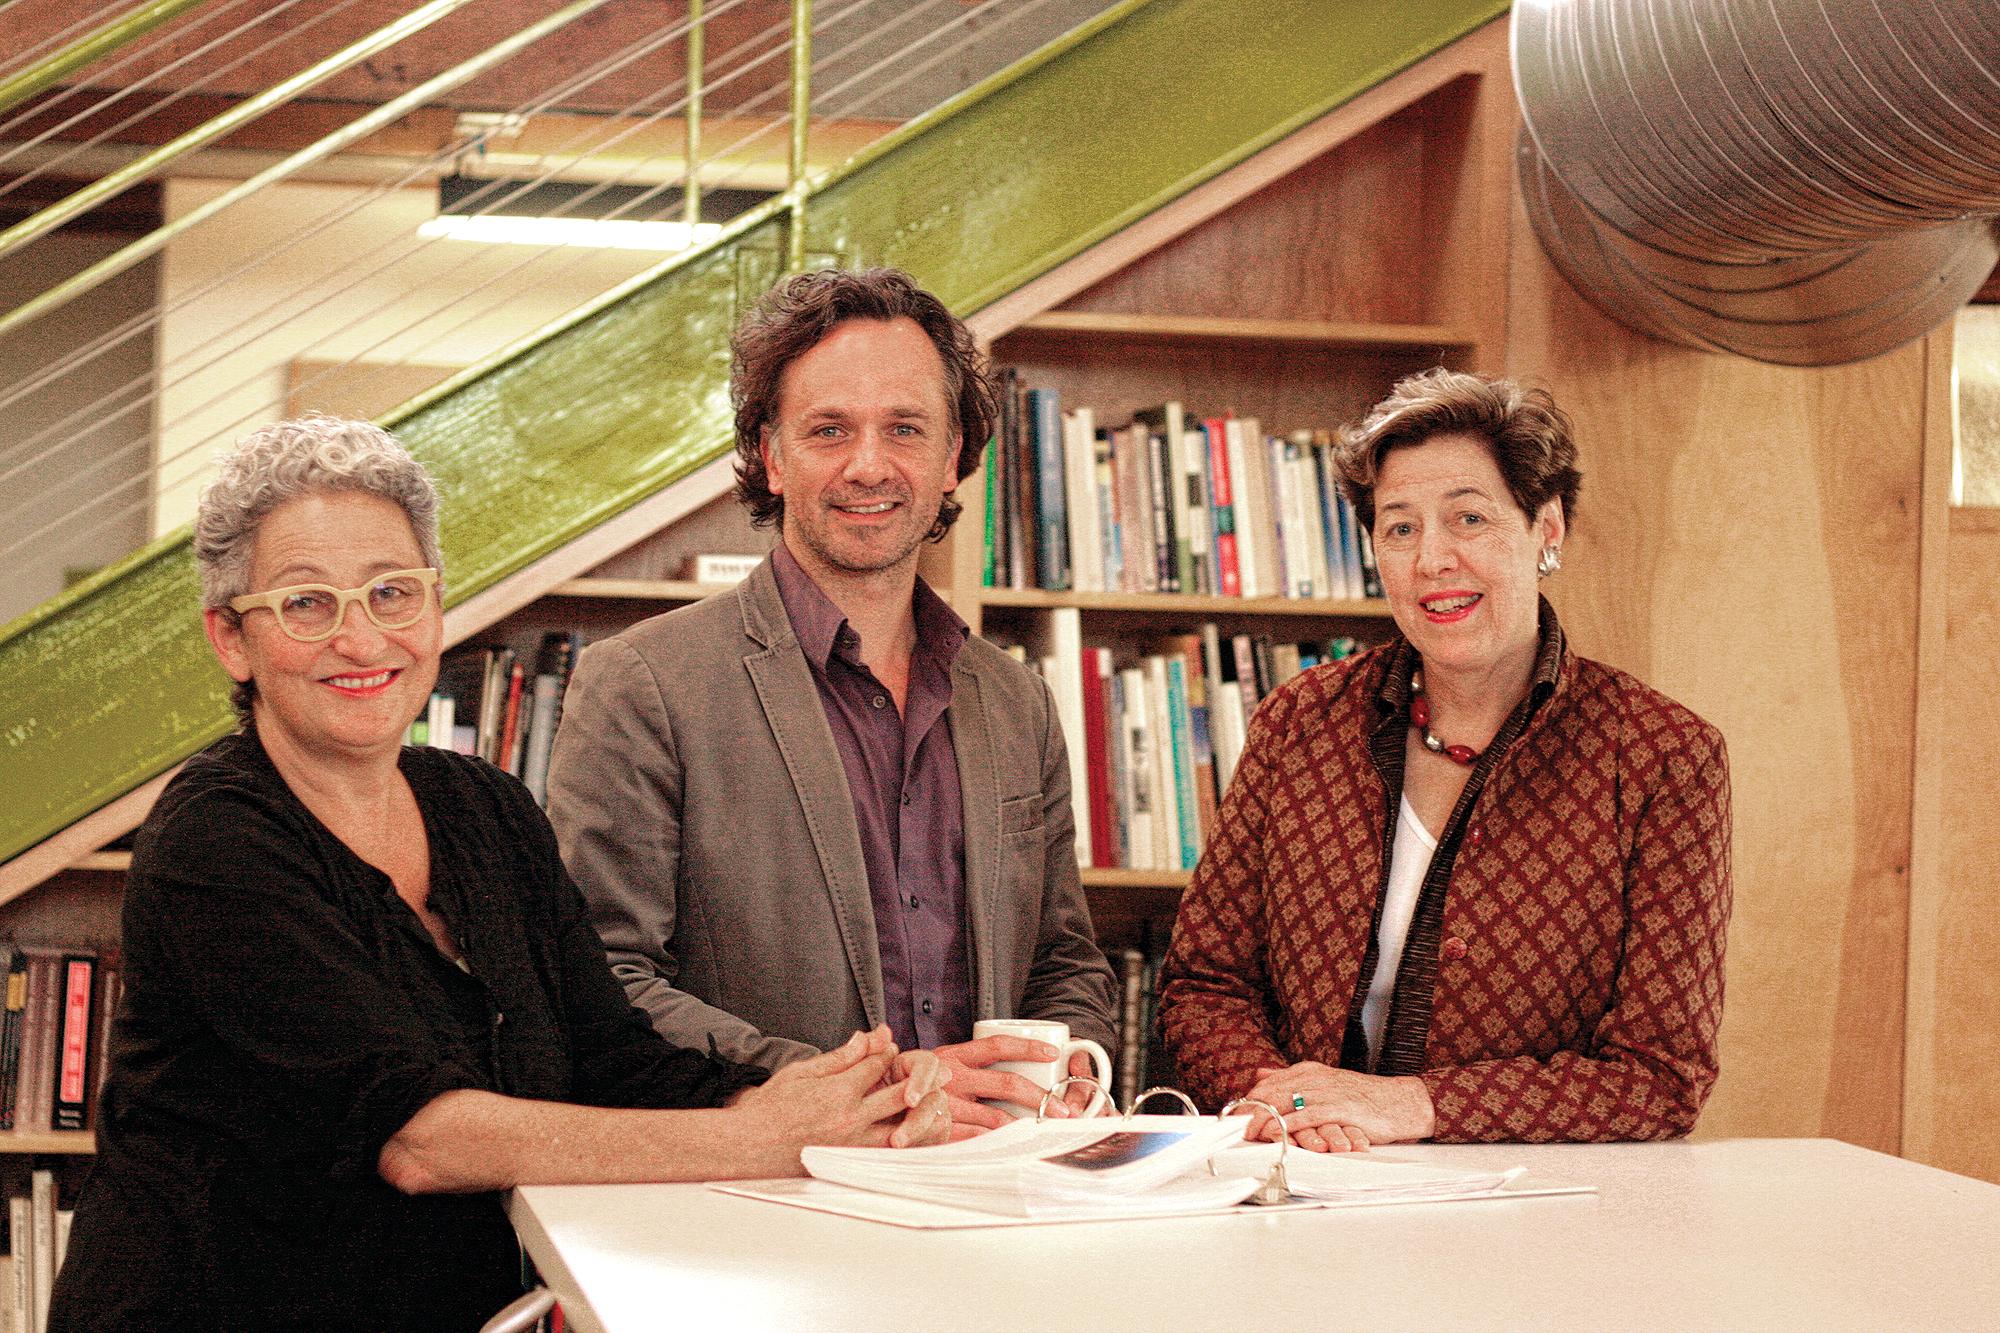 Eizenberg, Stockman, and Beha